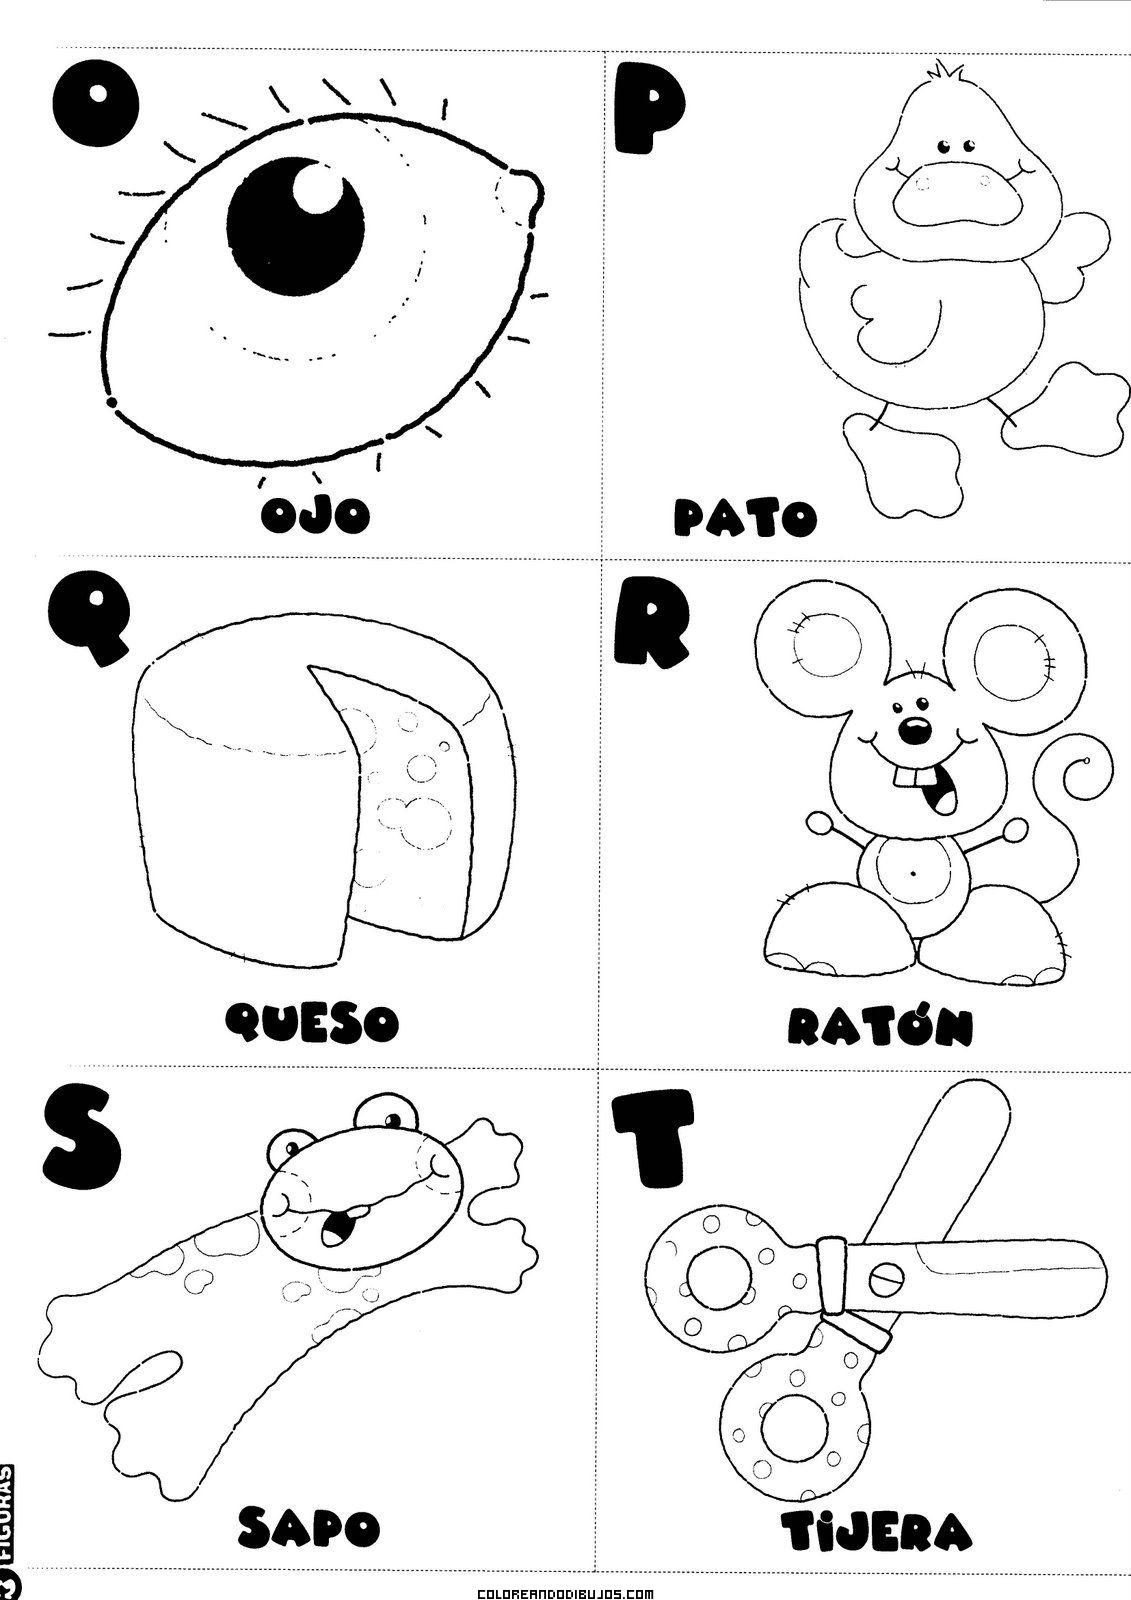 O, P, Q, R, S, T, para colorear